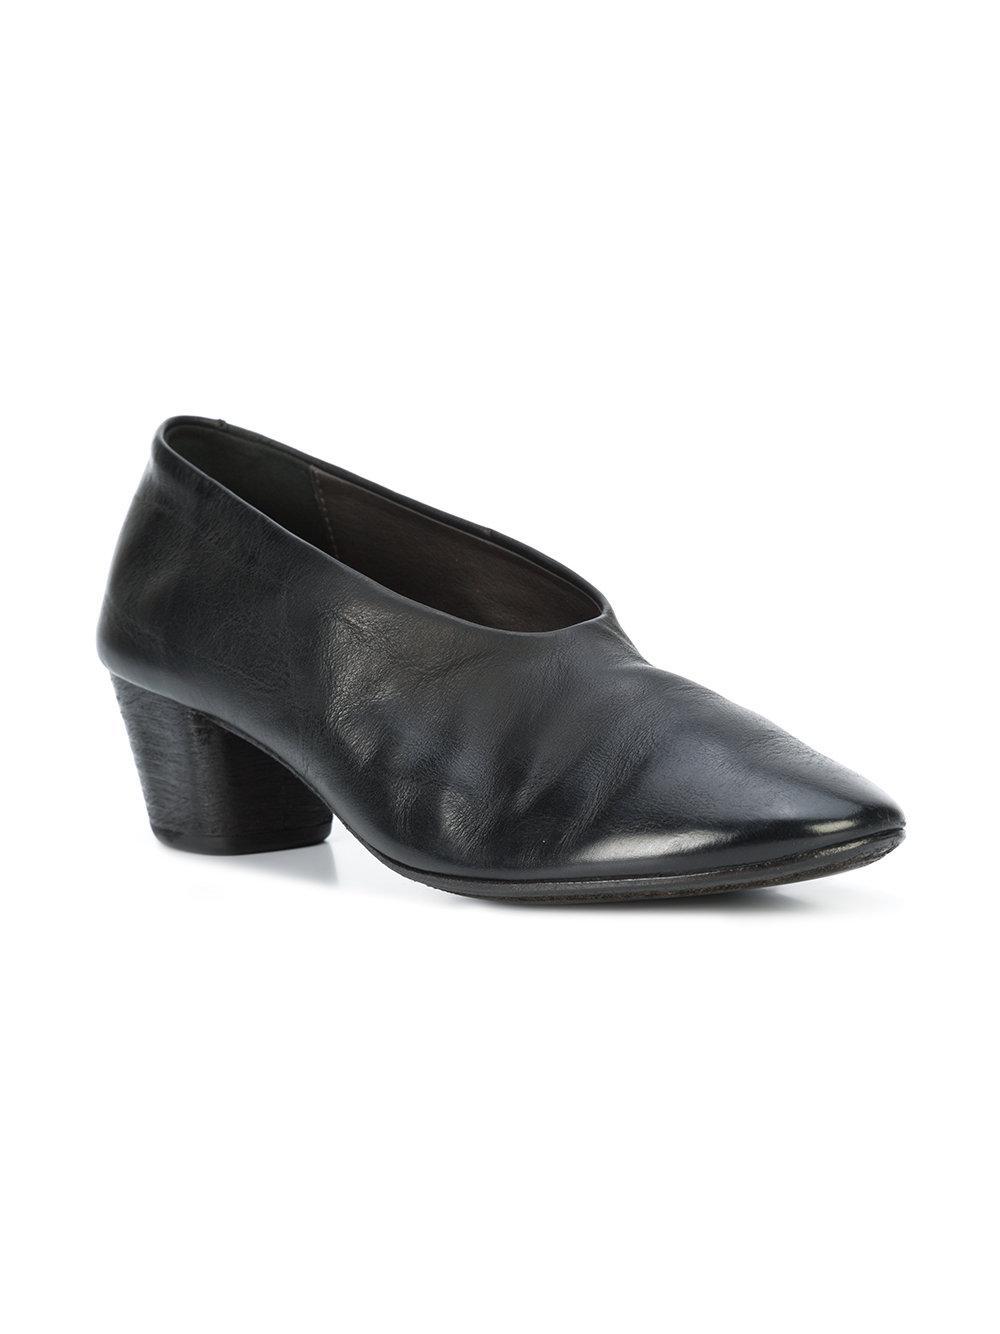 Marsèll slip-on loafer pumps pre order cheap price dVGQ0NUoF0